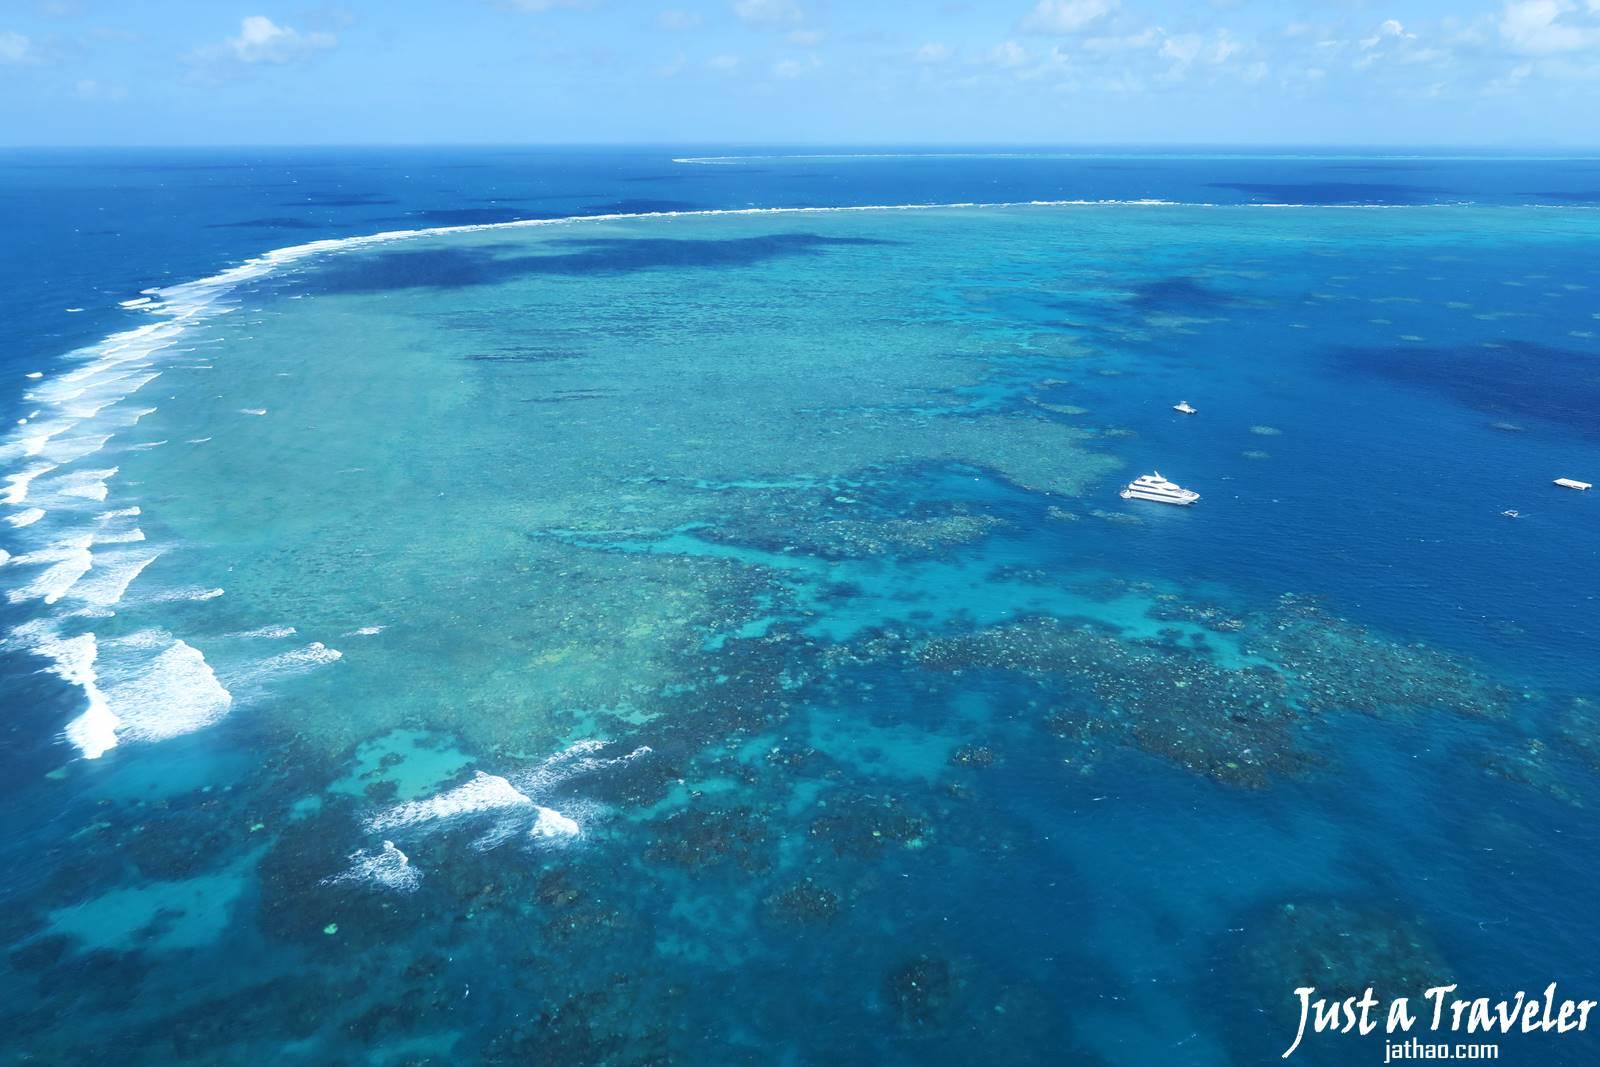 凱恩斯-大堡礁-外堡礁-推薦-公司-行程-旅遊-直升機-自由行-澳洲-Cairns-Outer-Great-Barrier-Reef-helicopter-Travel-Australia